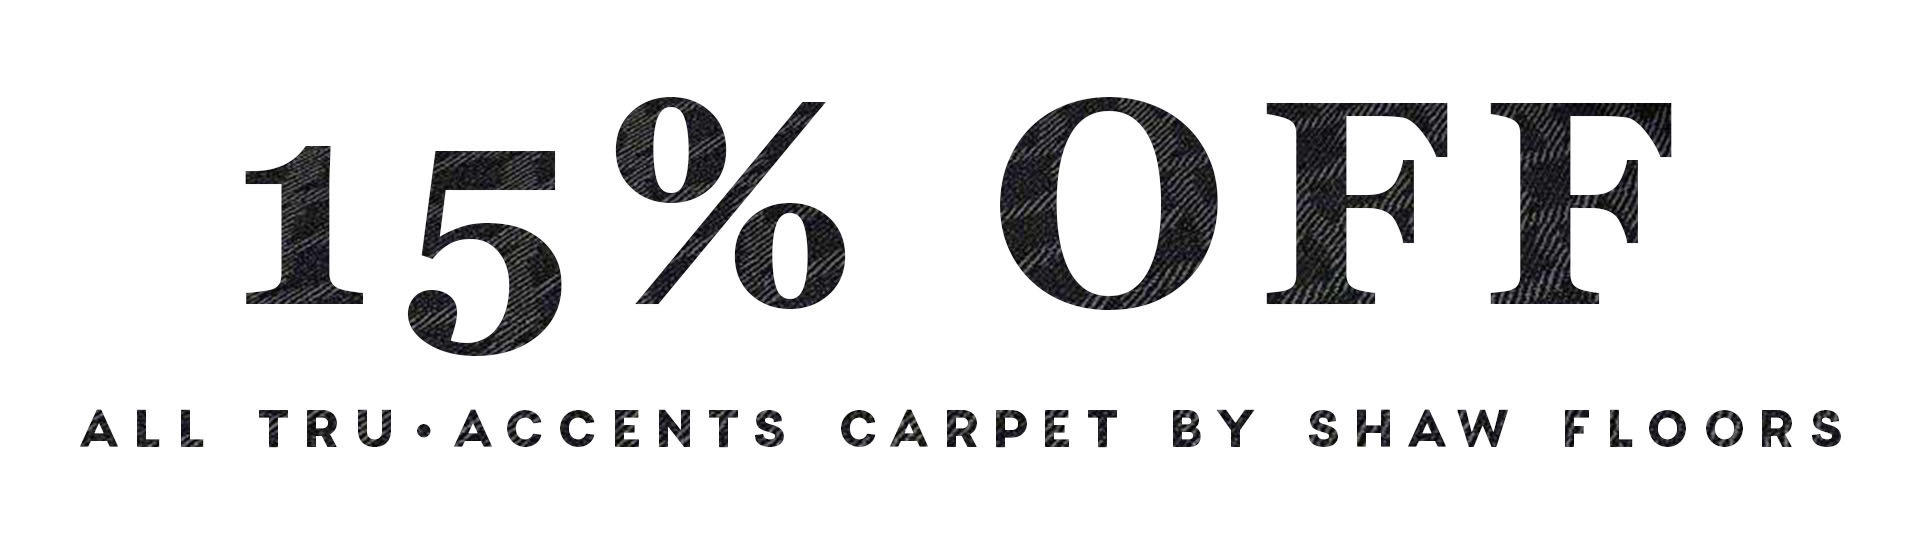 15%-off-tru-accents-shaw-floors-sale-october-6-2018-D&S-flooring.jpg